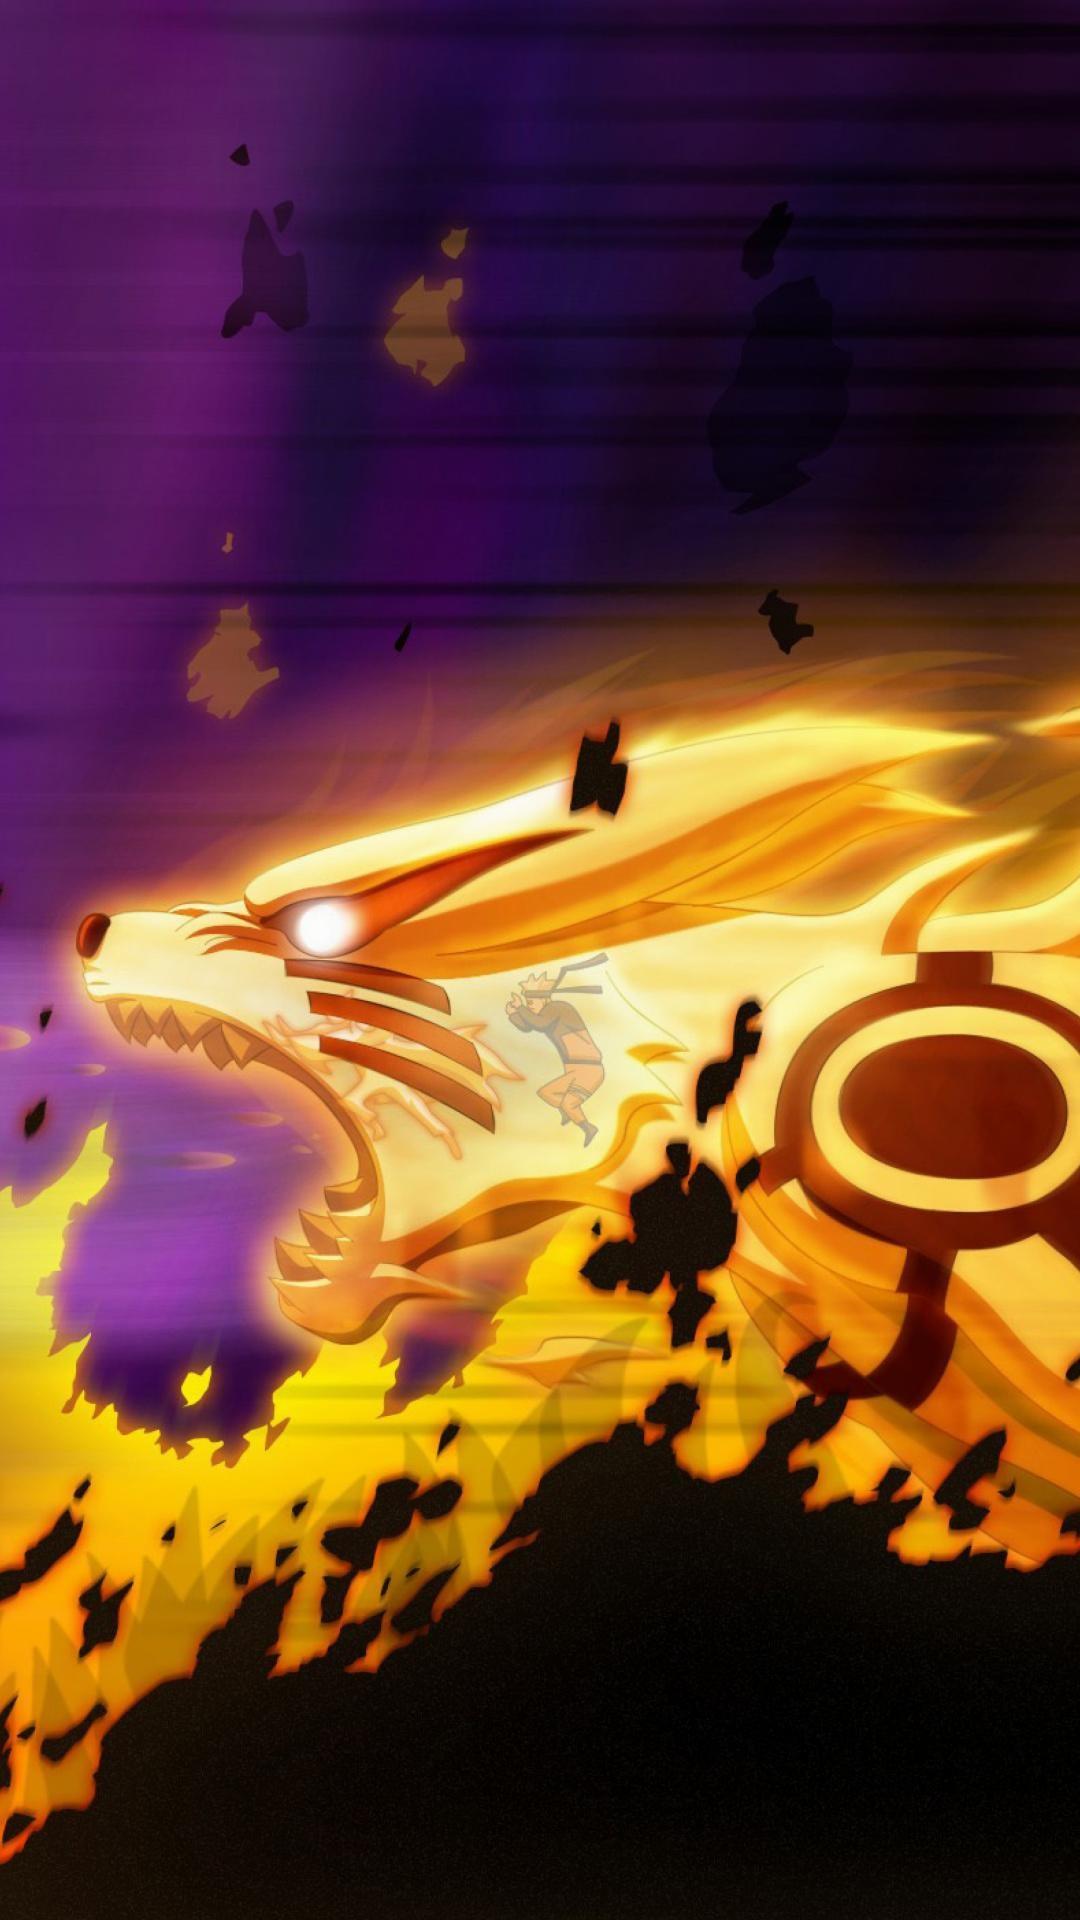 wallpaper.wiki-Kyuubi-from-Naruto-Iphone-Wallpaper-PIC-